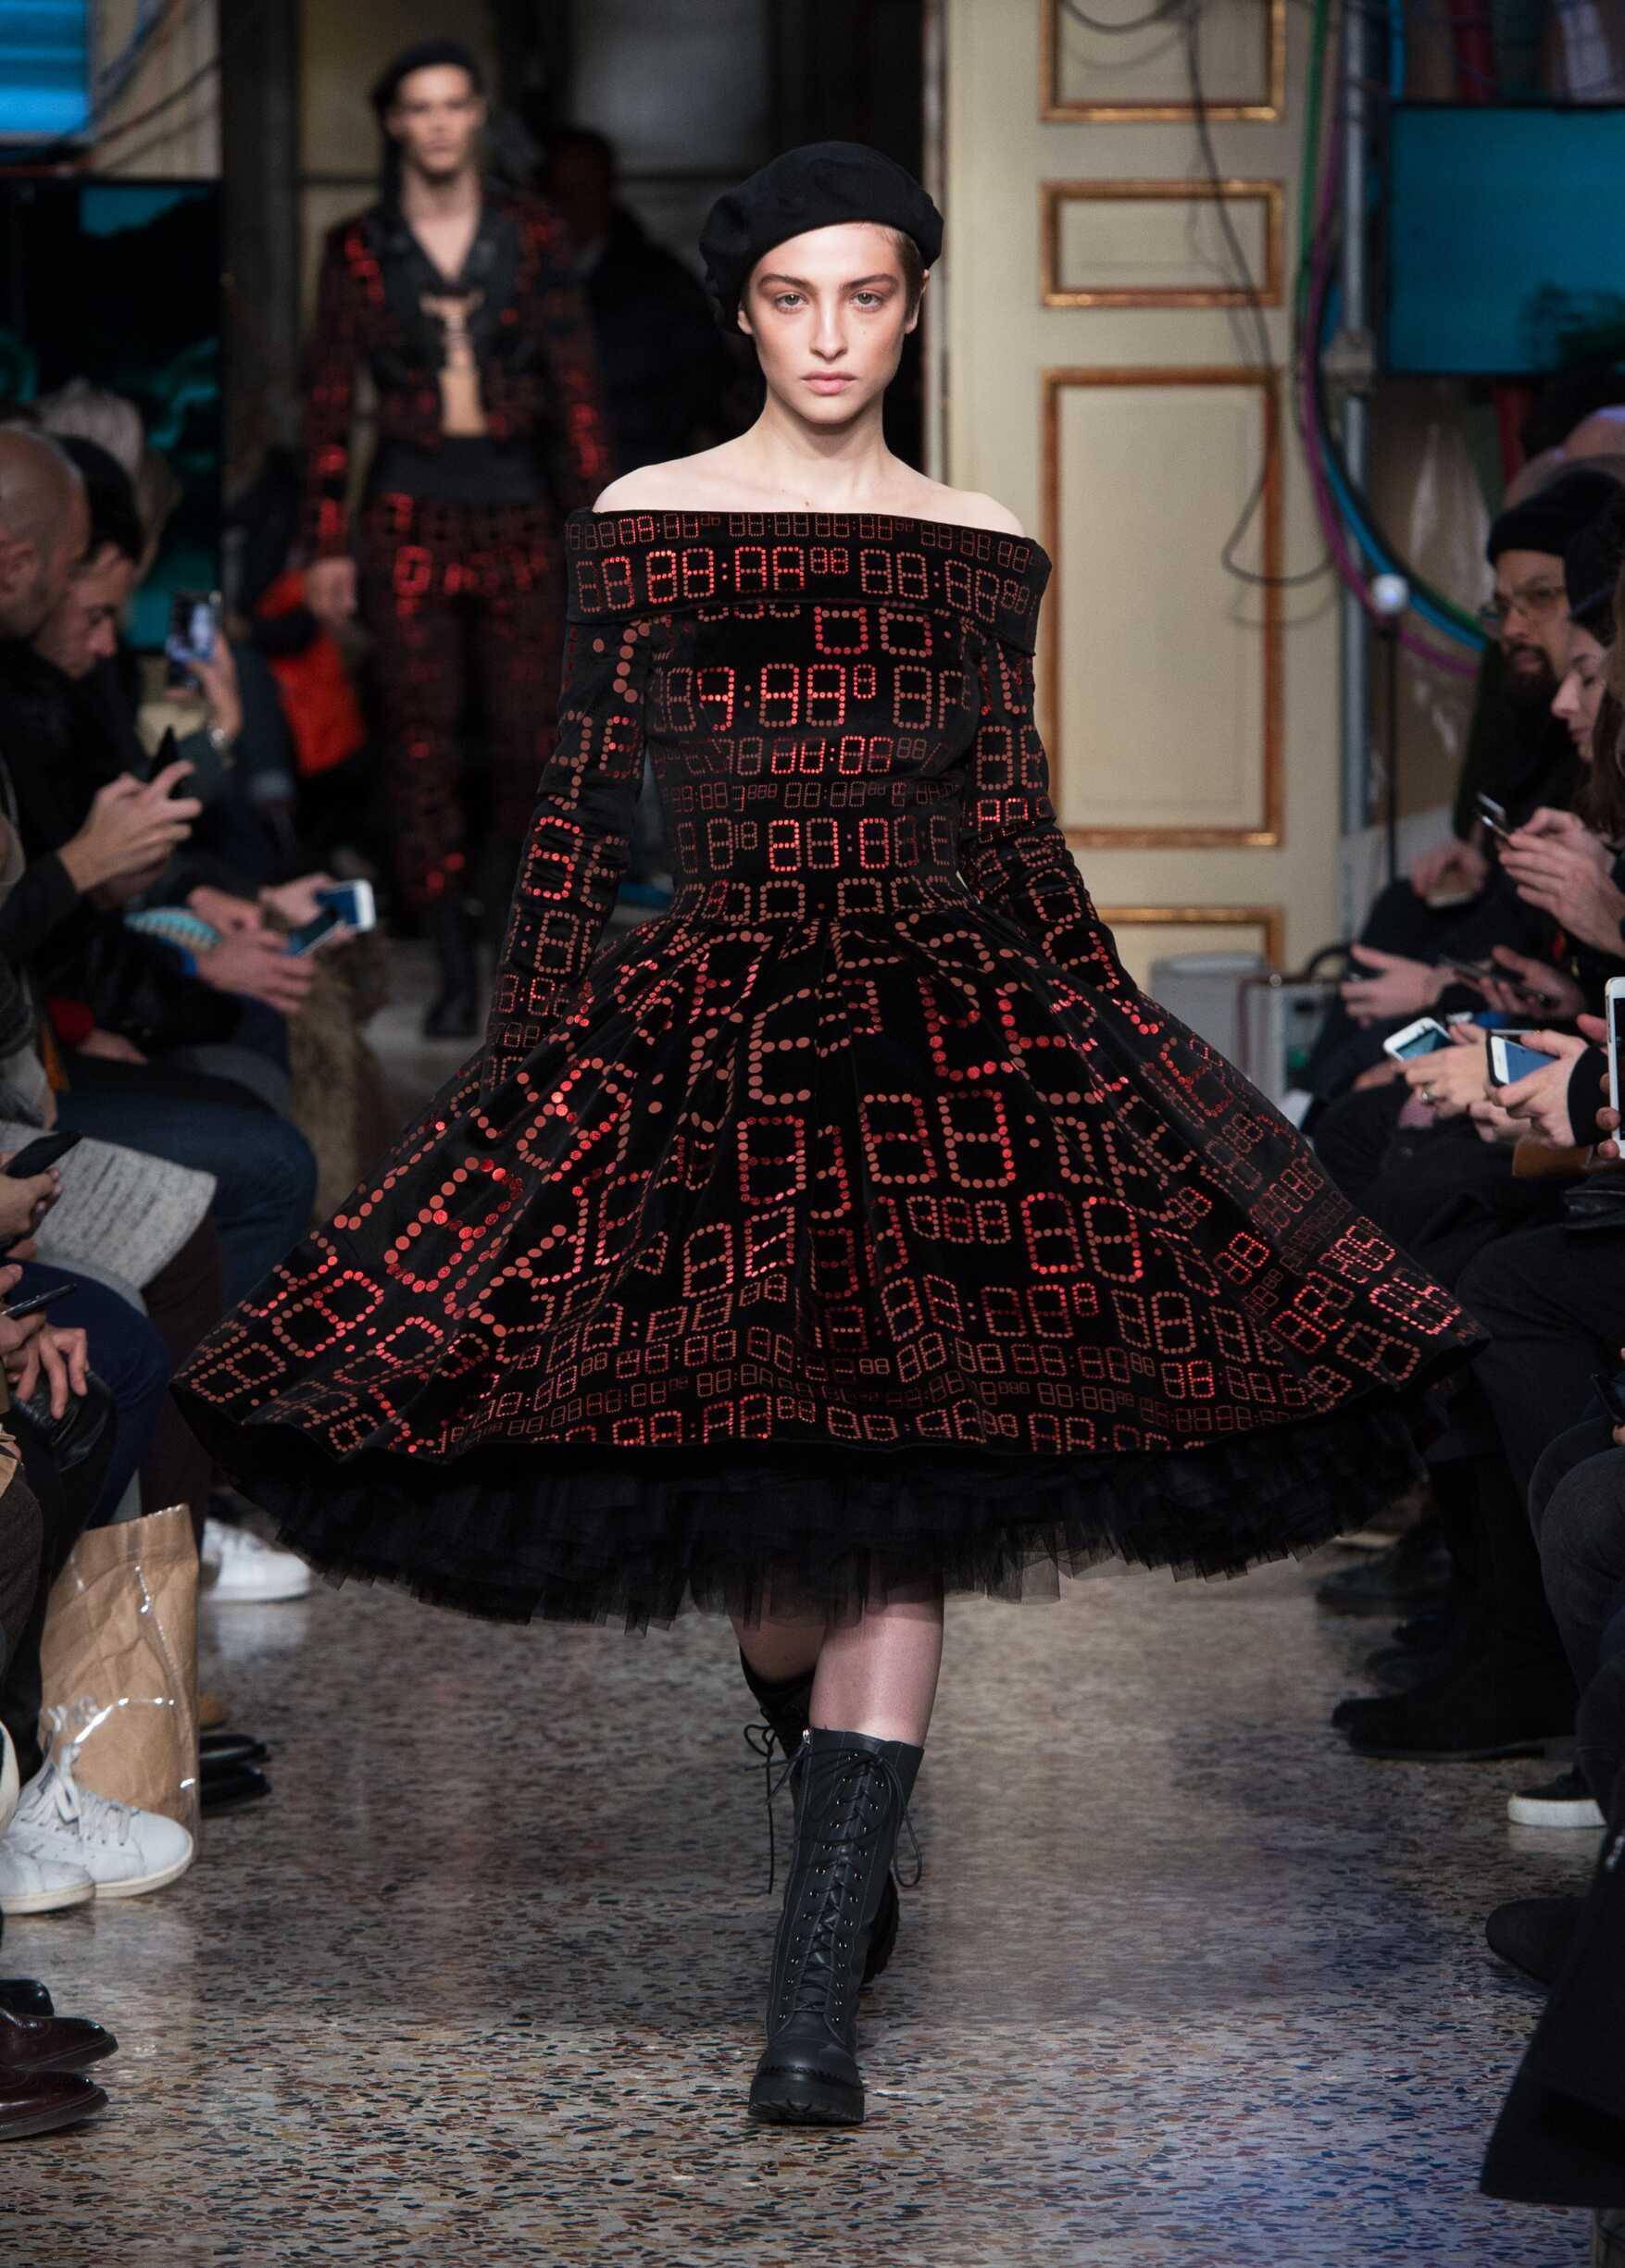 Woman Fall 2017 Fashion Trends Moschino